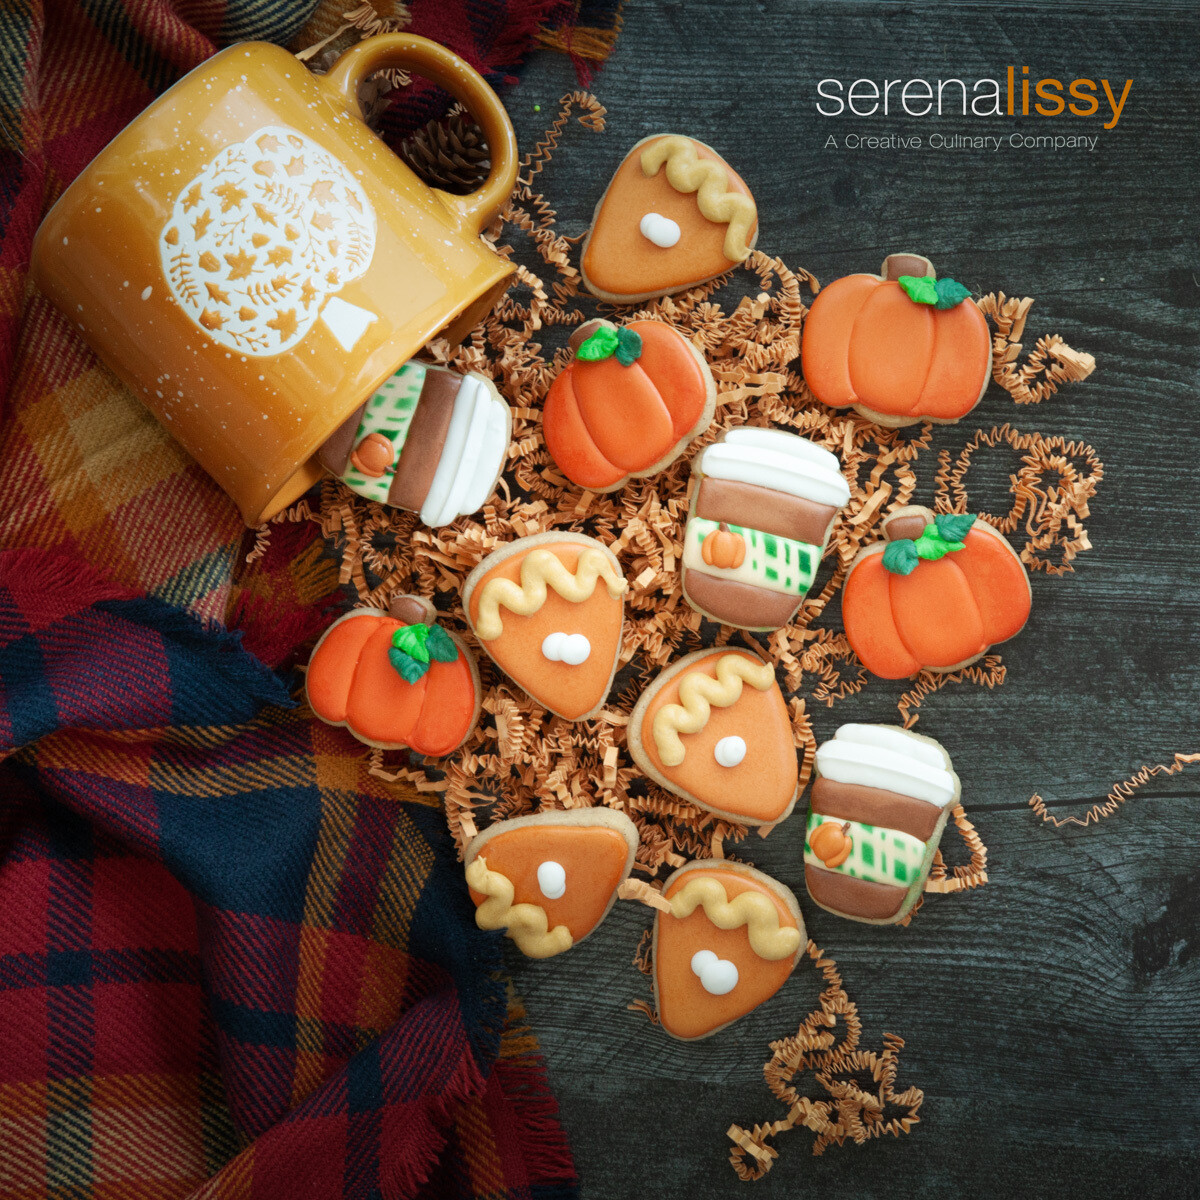 12 decorated mini sugar cookies with mug